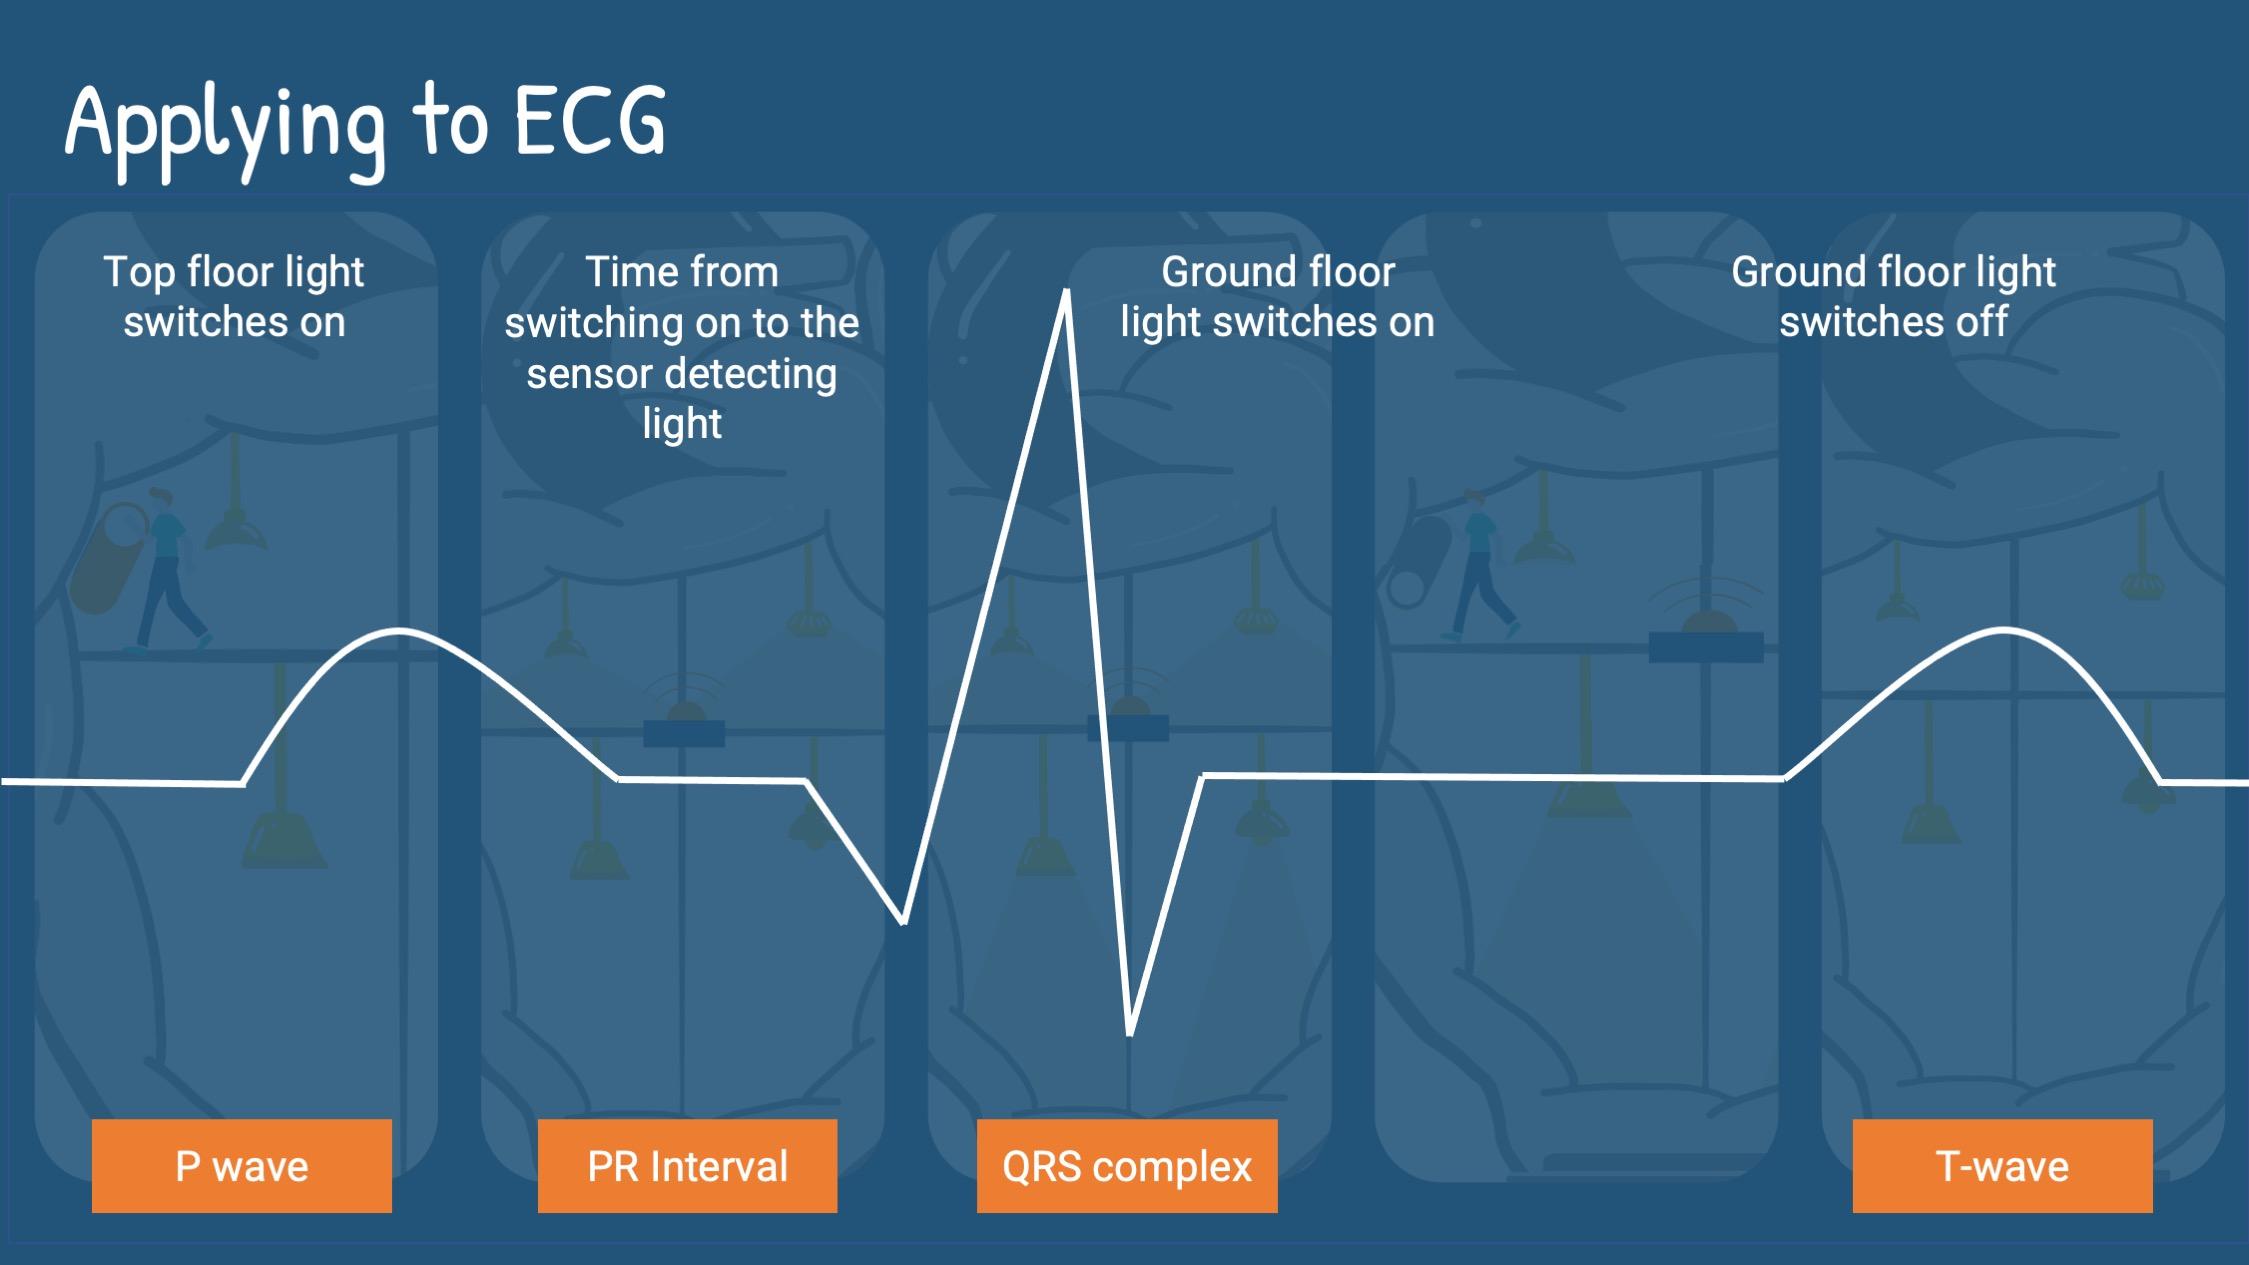 applying to ECG analogy